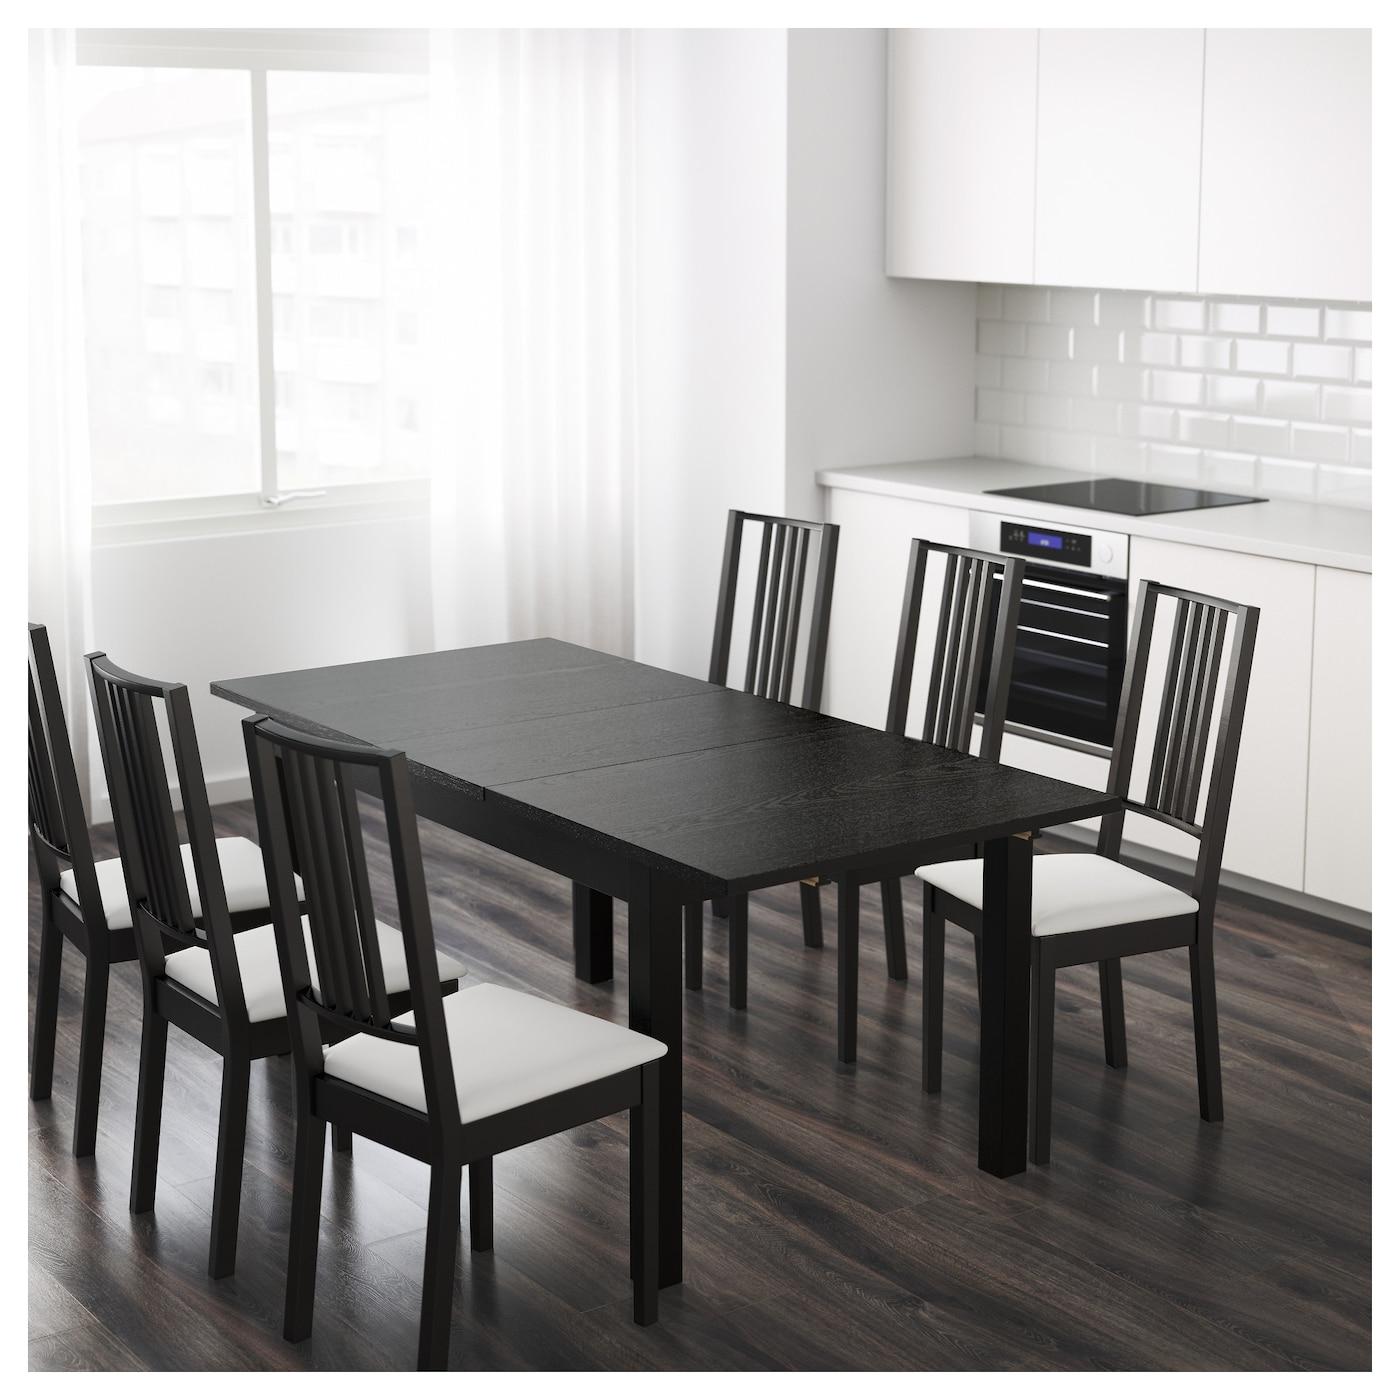 bjursta table extensible brun noir 140 180 220 x 84 cm ikea. Black Bedroom Furniture Sets. Home Design Ideas